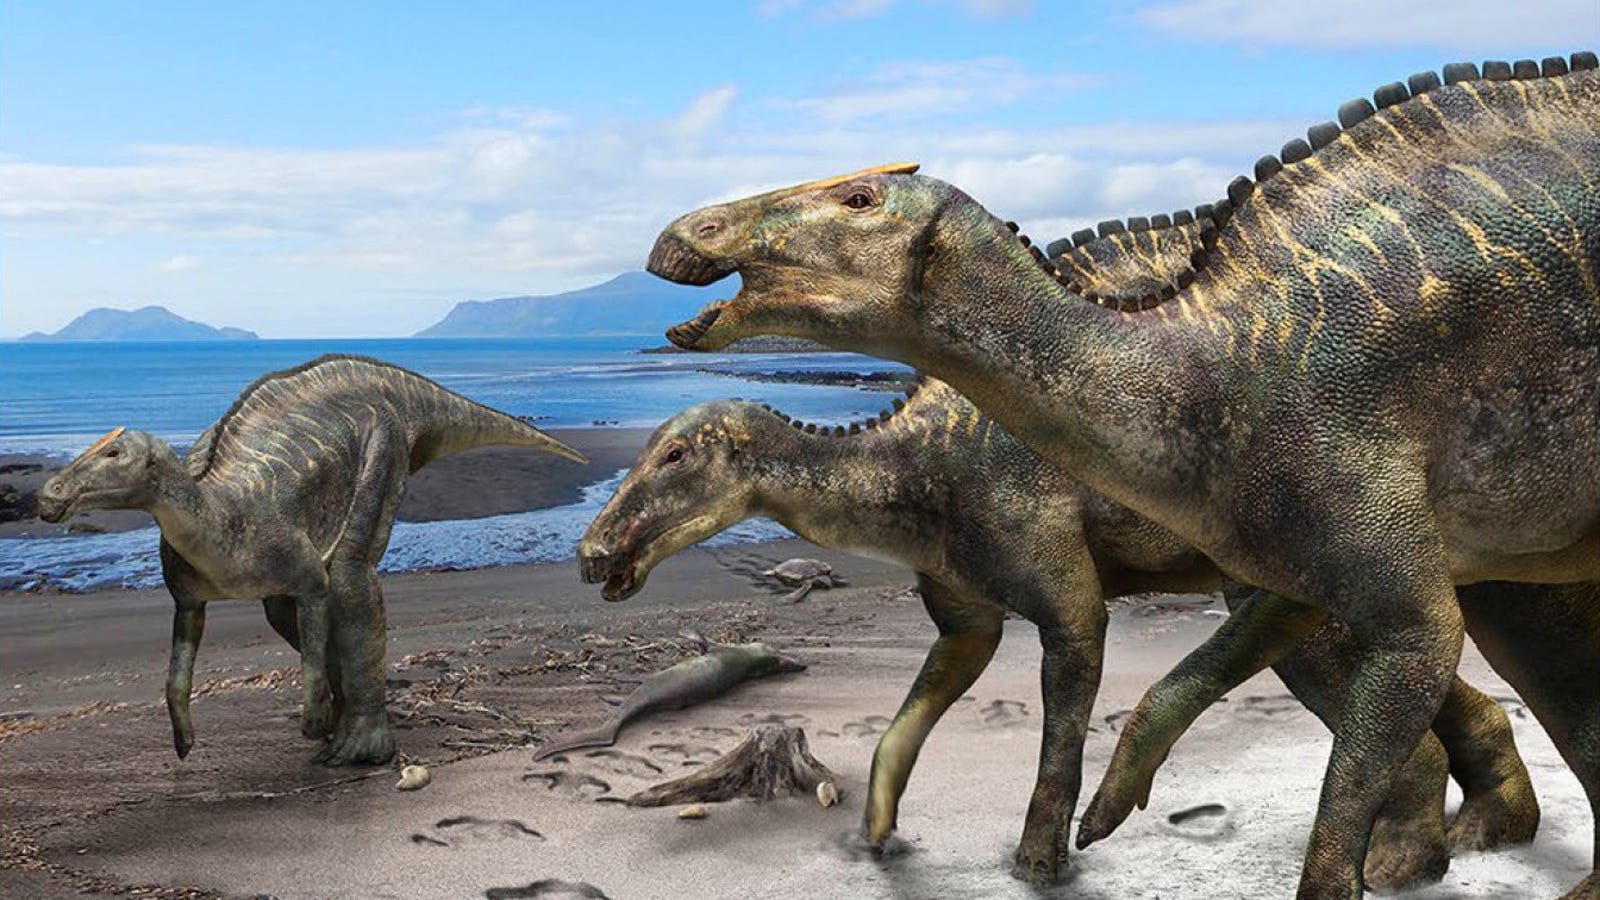 Newly Discovered Japanese Duck-Billed Dinosaur Was a Cretaceous Beach Bum